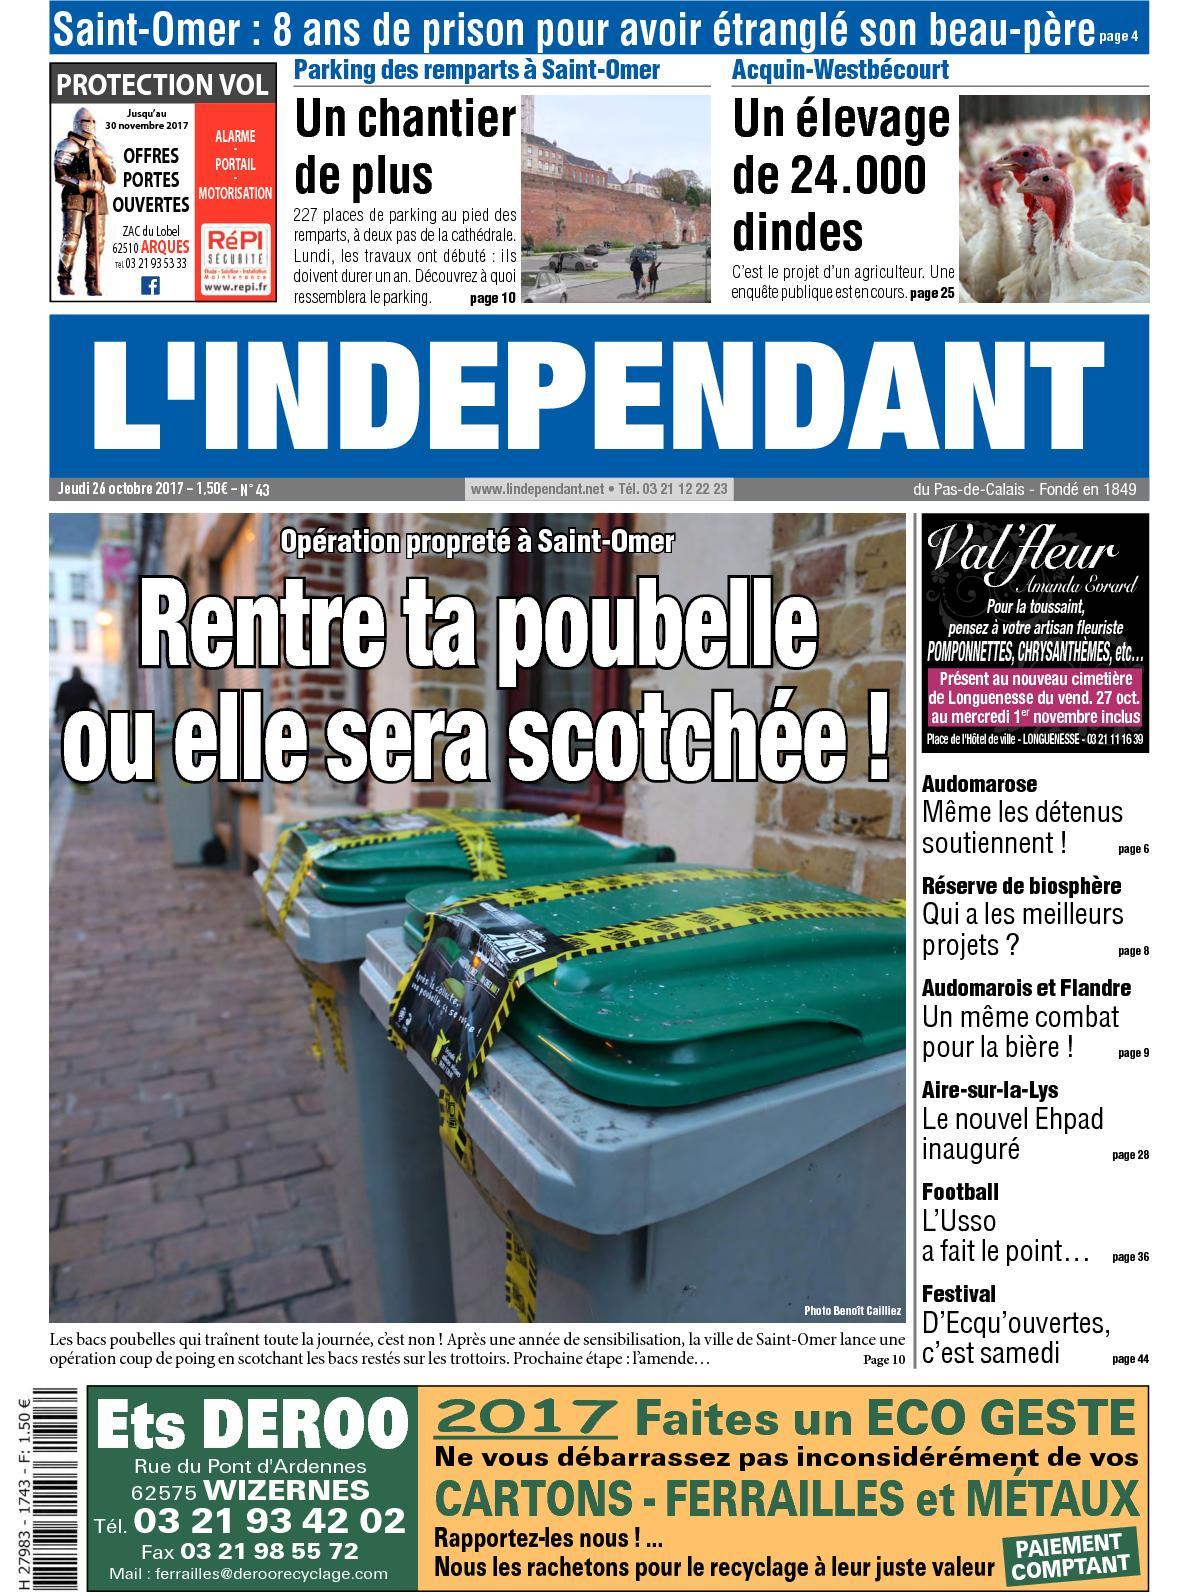 d9a169f88e Calaméo - L'indépendant Semaine 43 2017